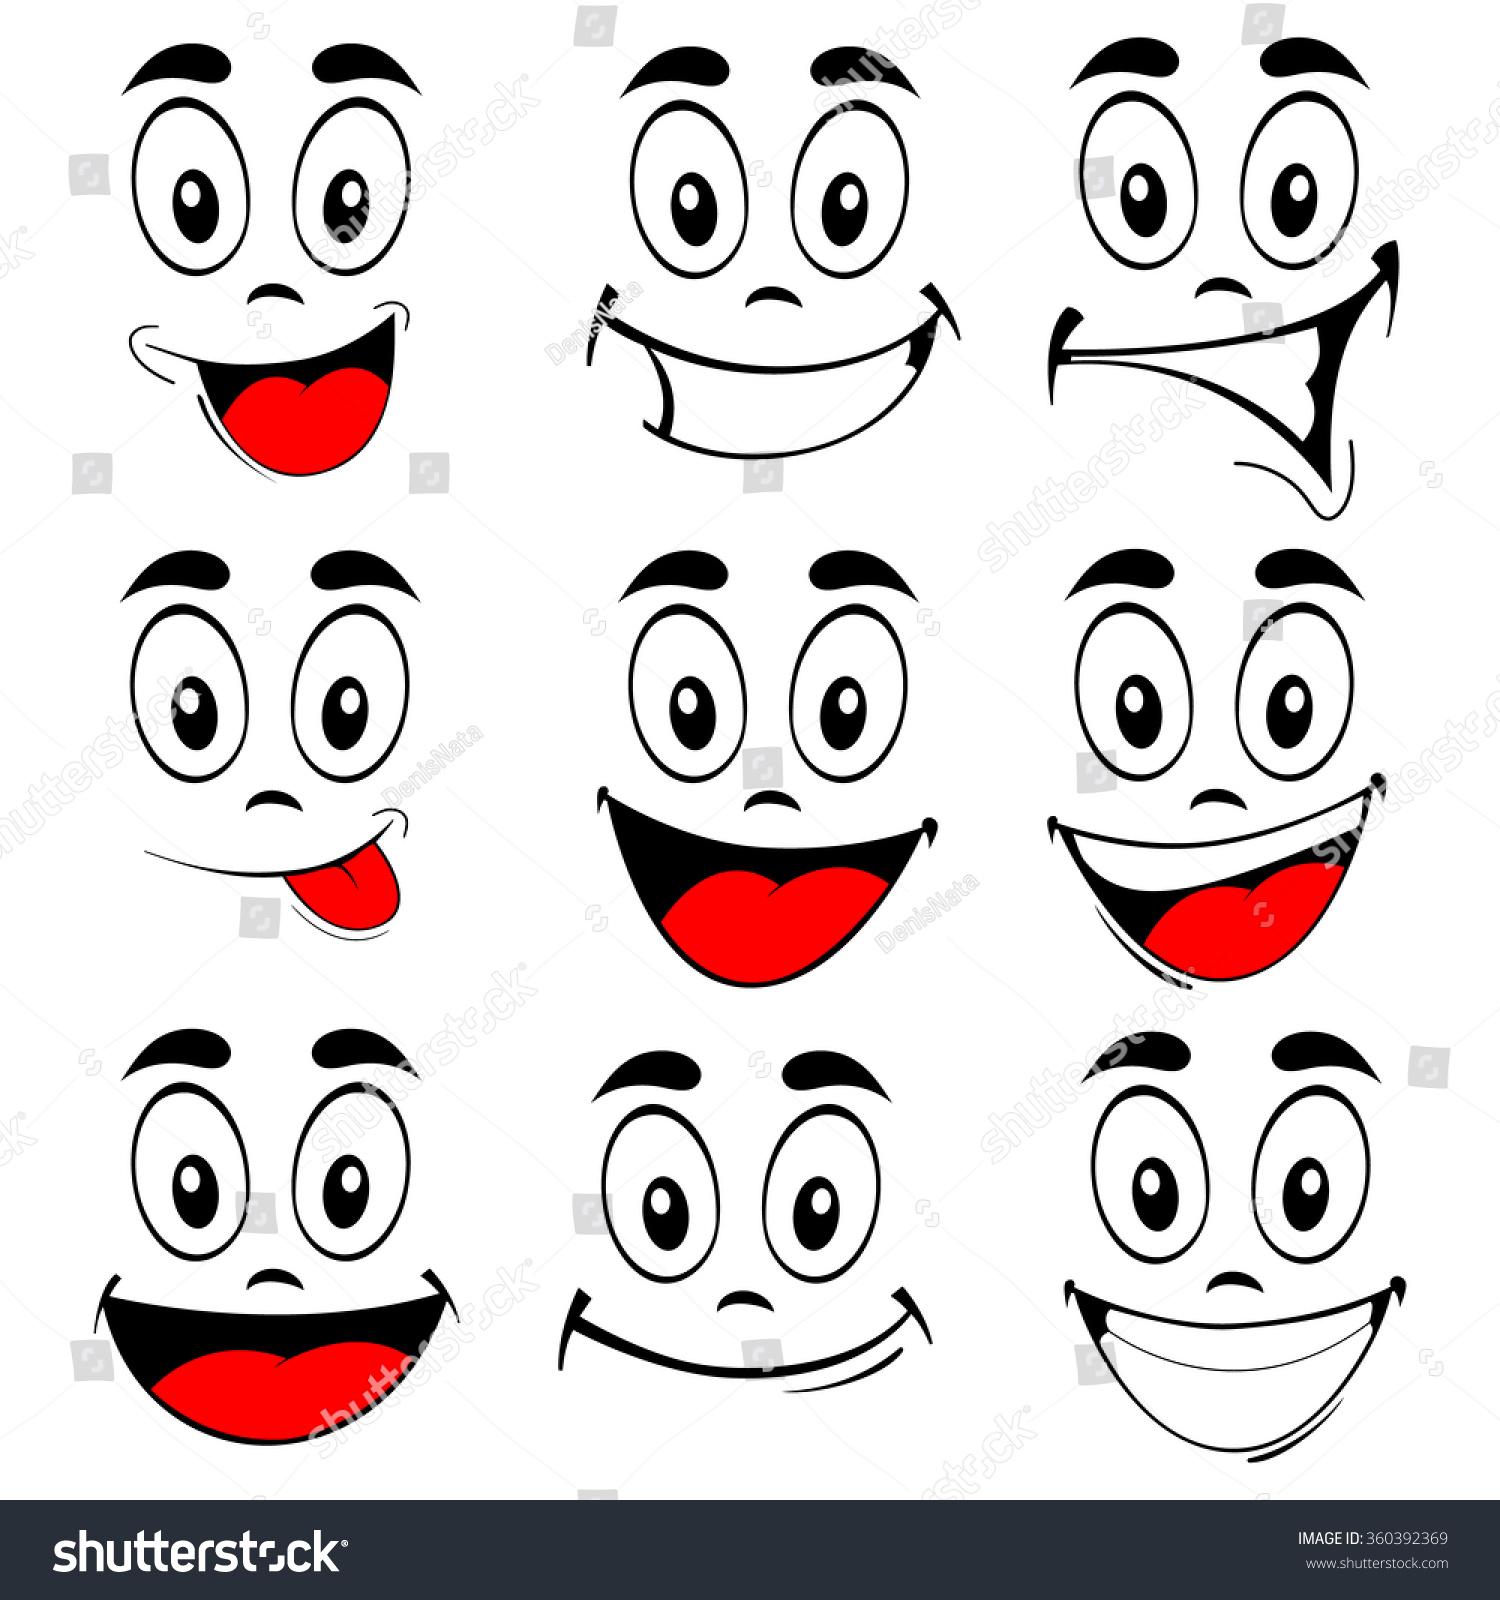 Vector Illustration Set Smiling Cartoon Faces Stock Vector